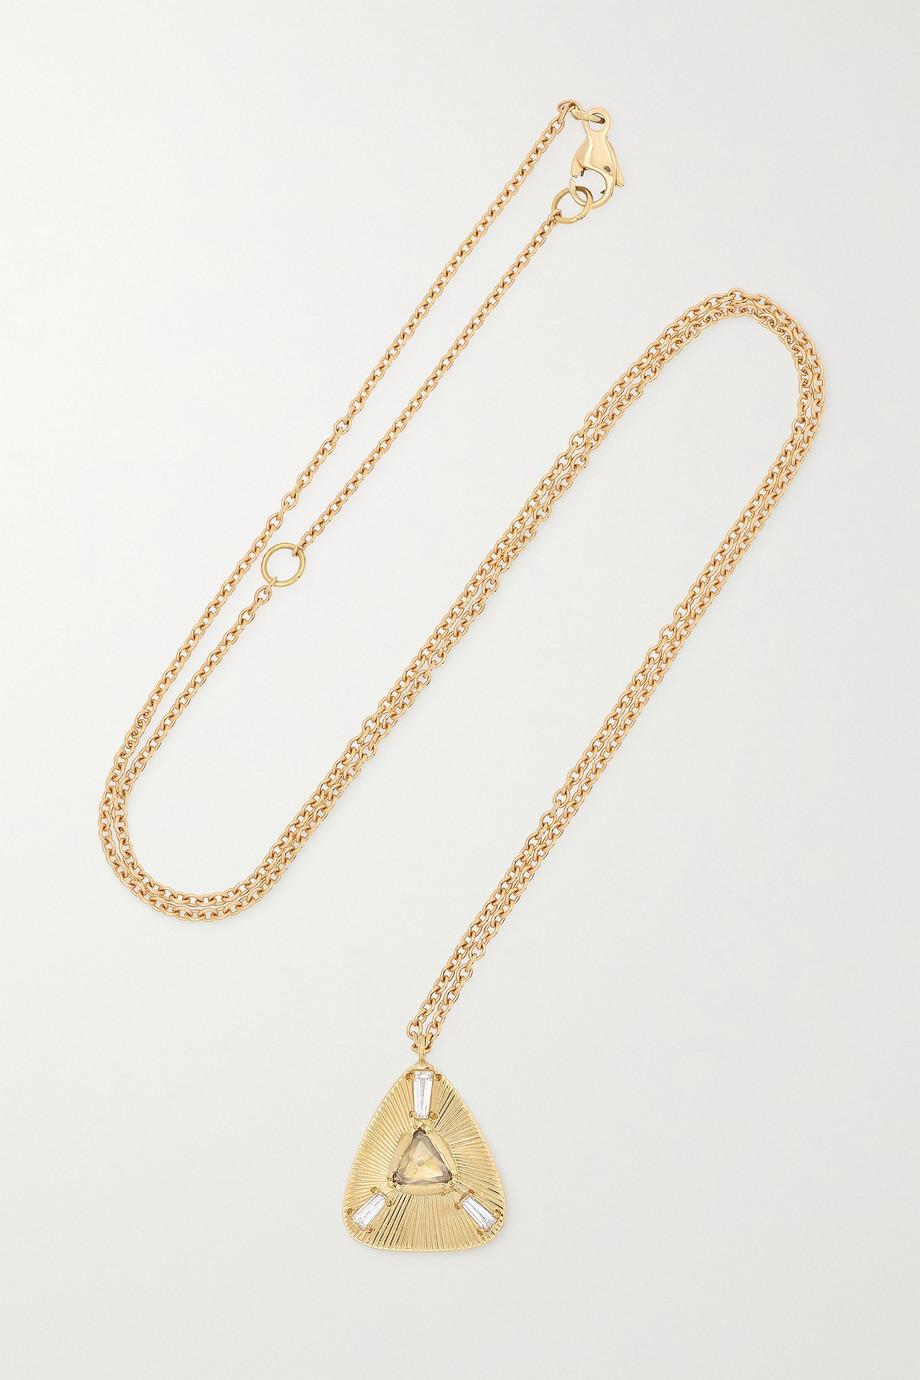 Brooke Gregson Ellipse 18-karat gold diamond necklace